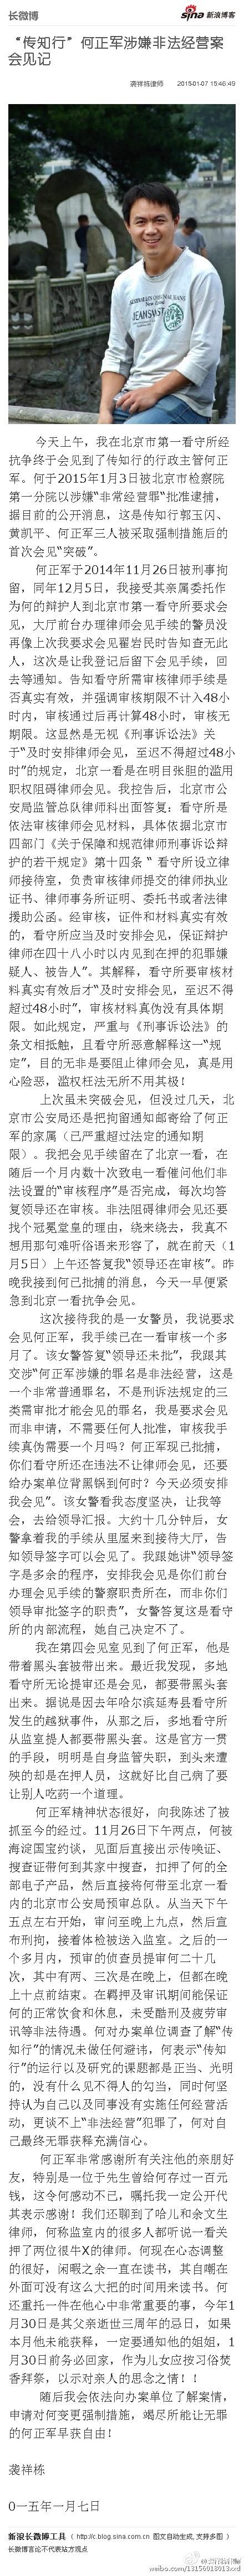 He Zhengjun-lawyer